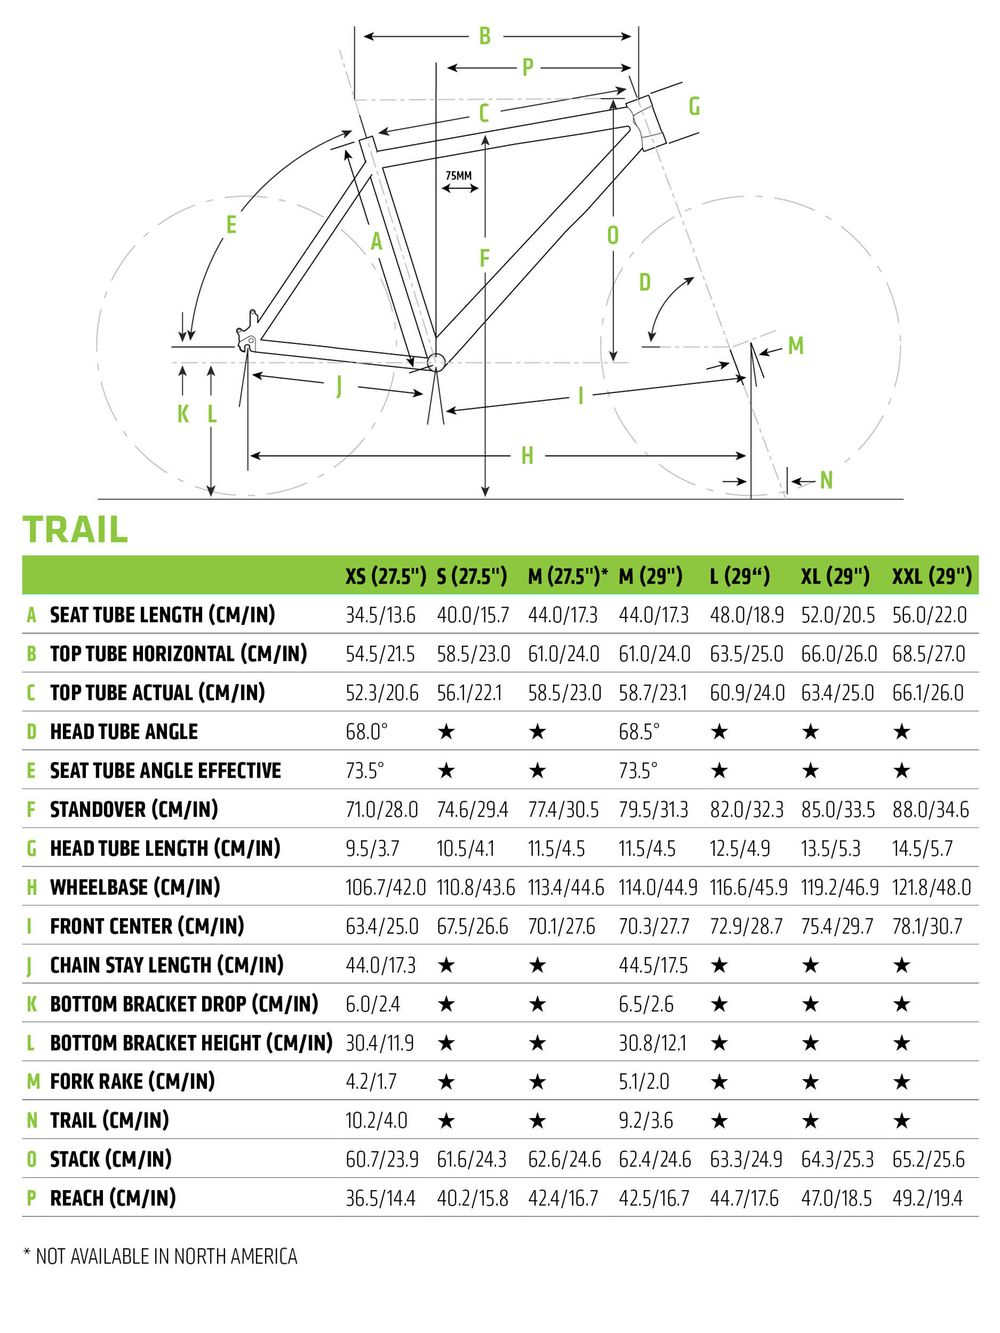 Trail 3 -